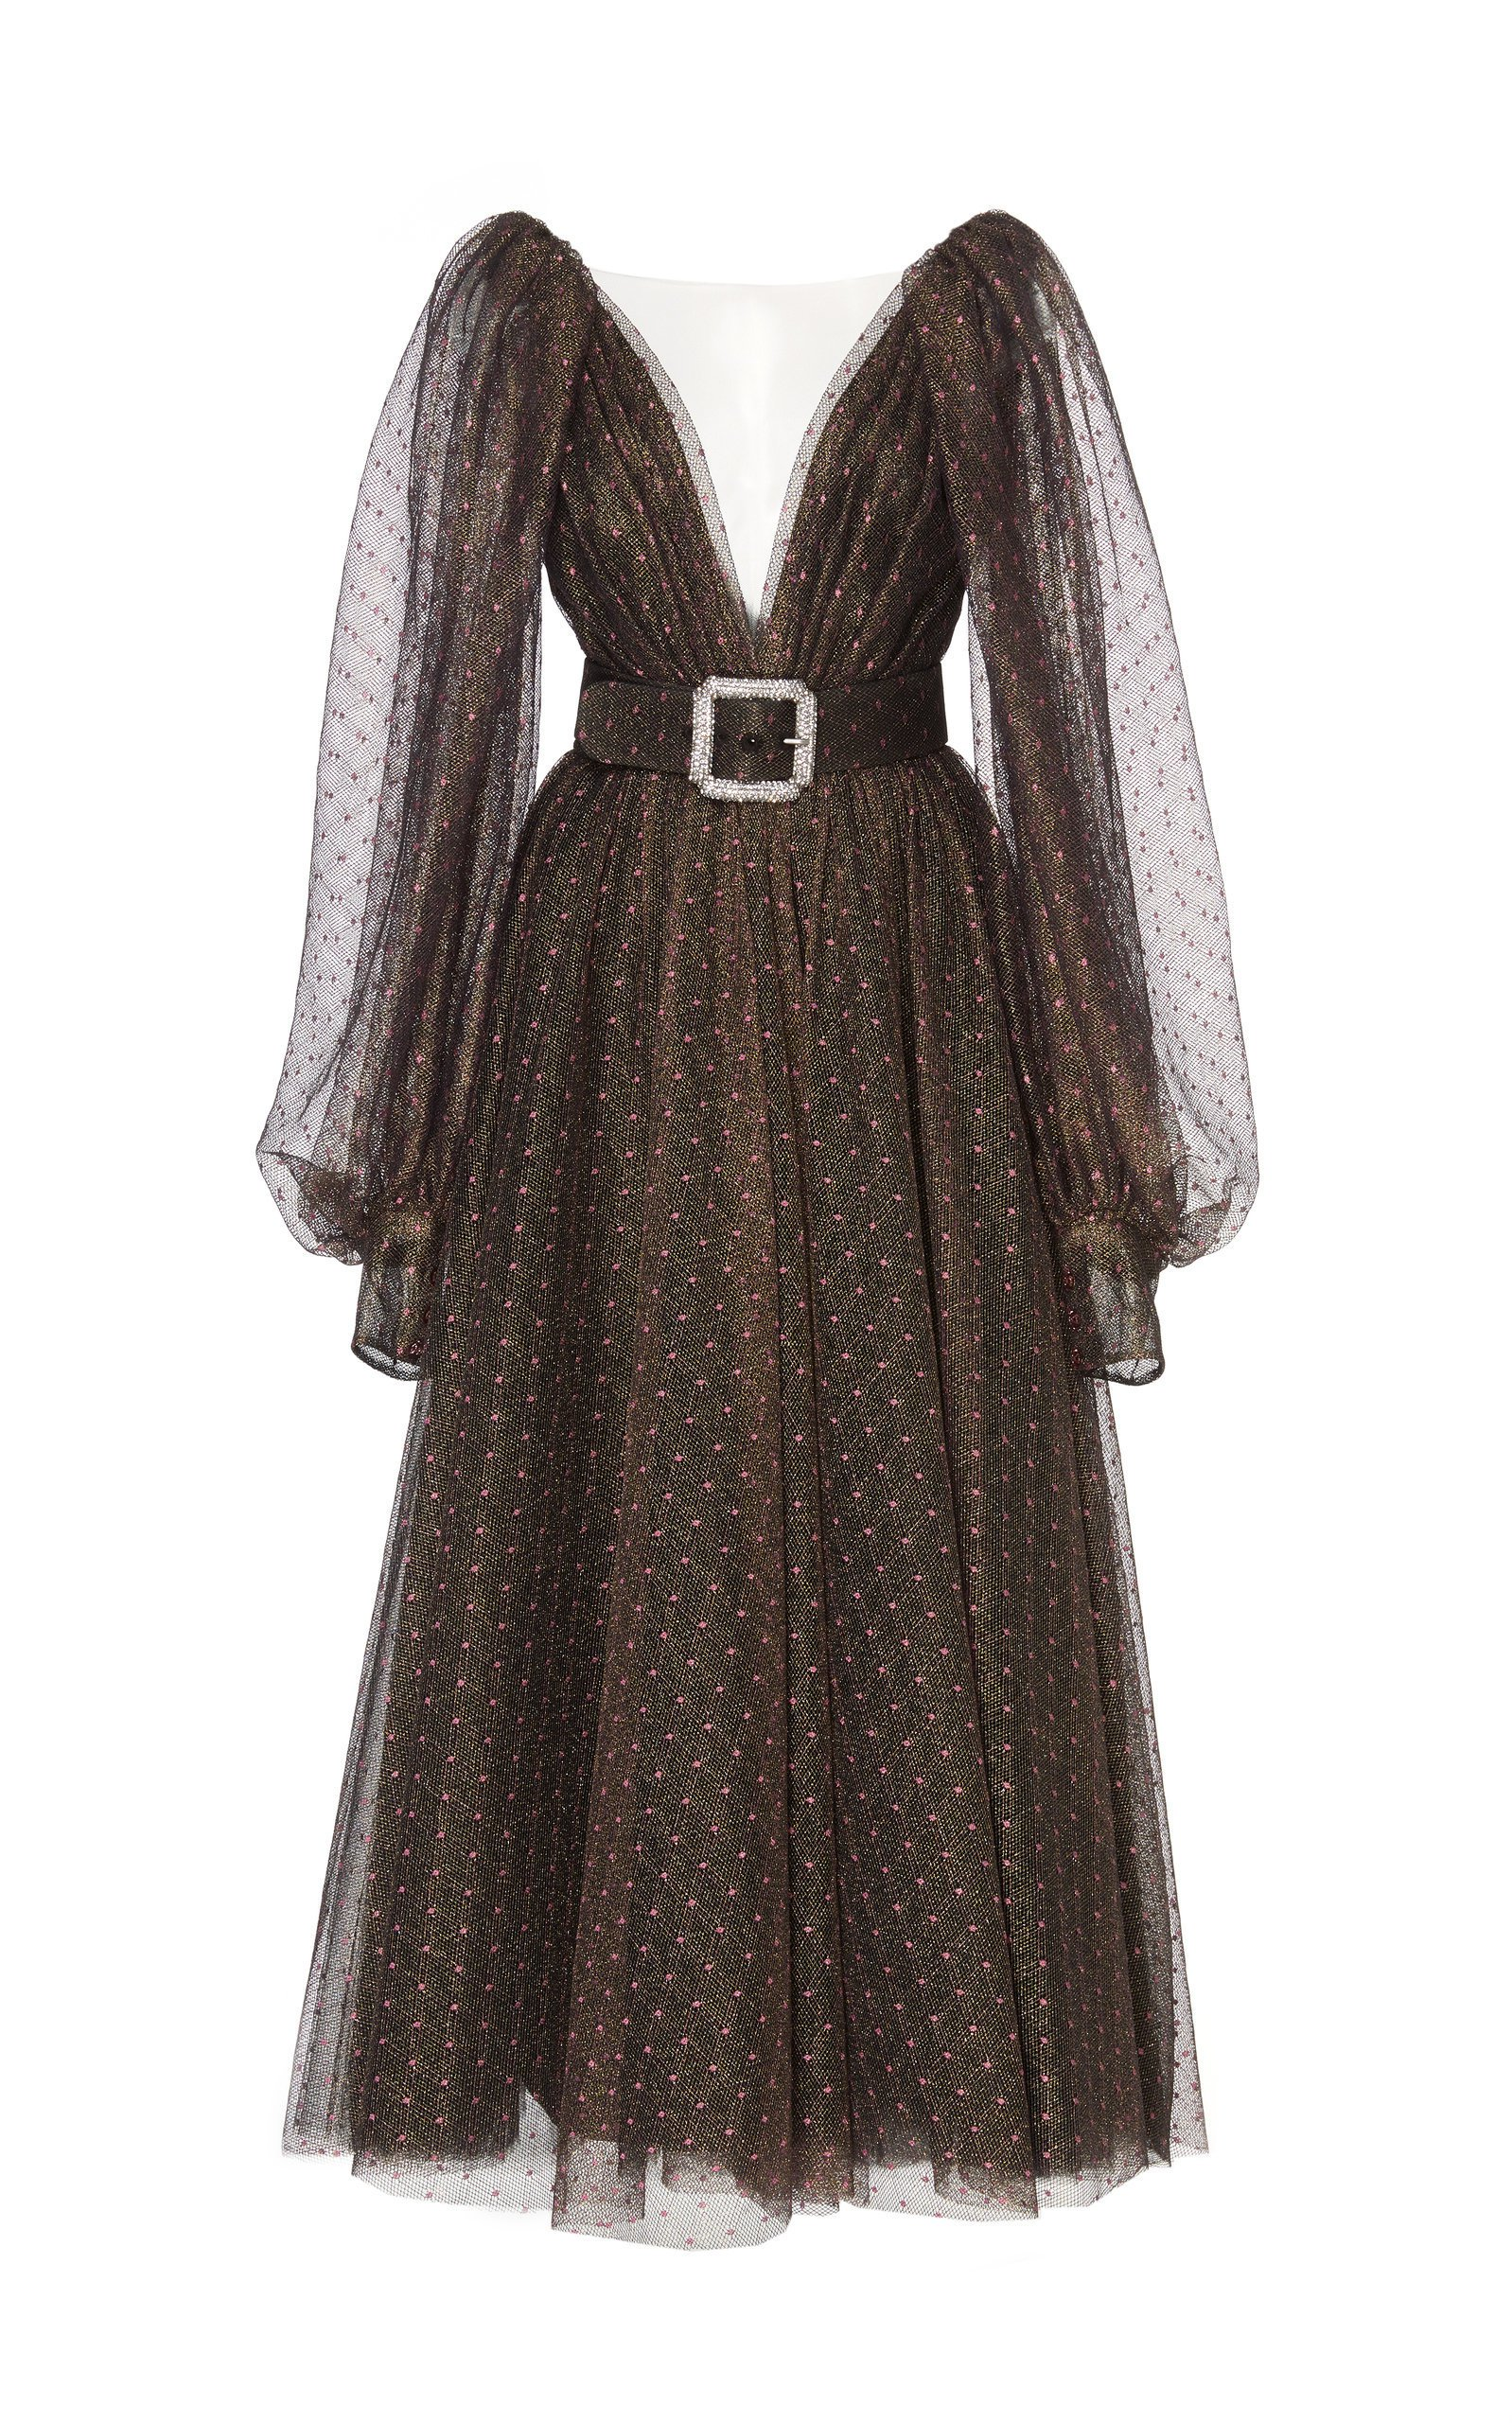 Monique Lhuillier Belted Polka-Dot Lurex Dress